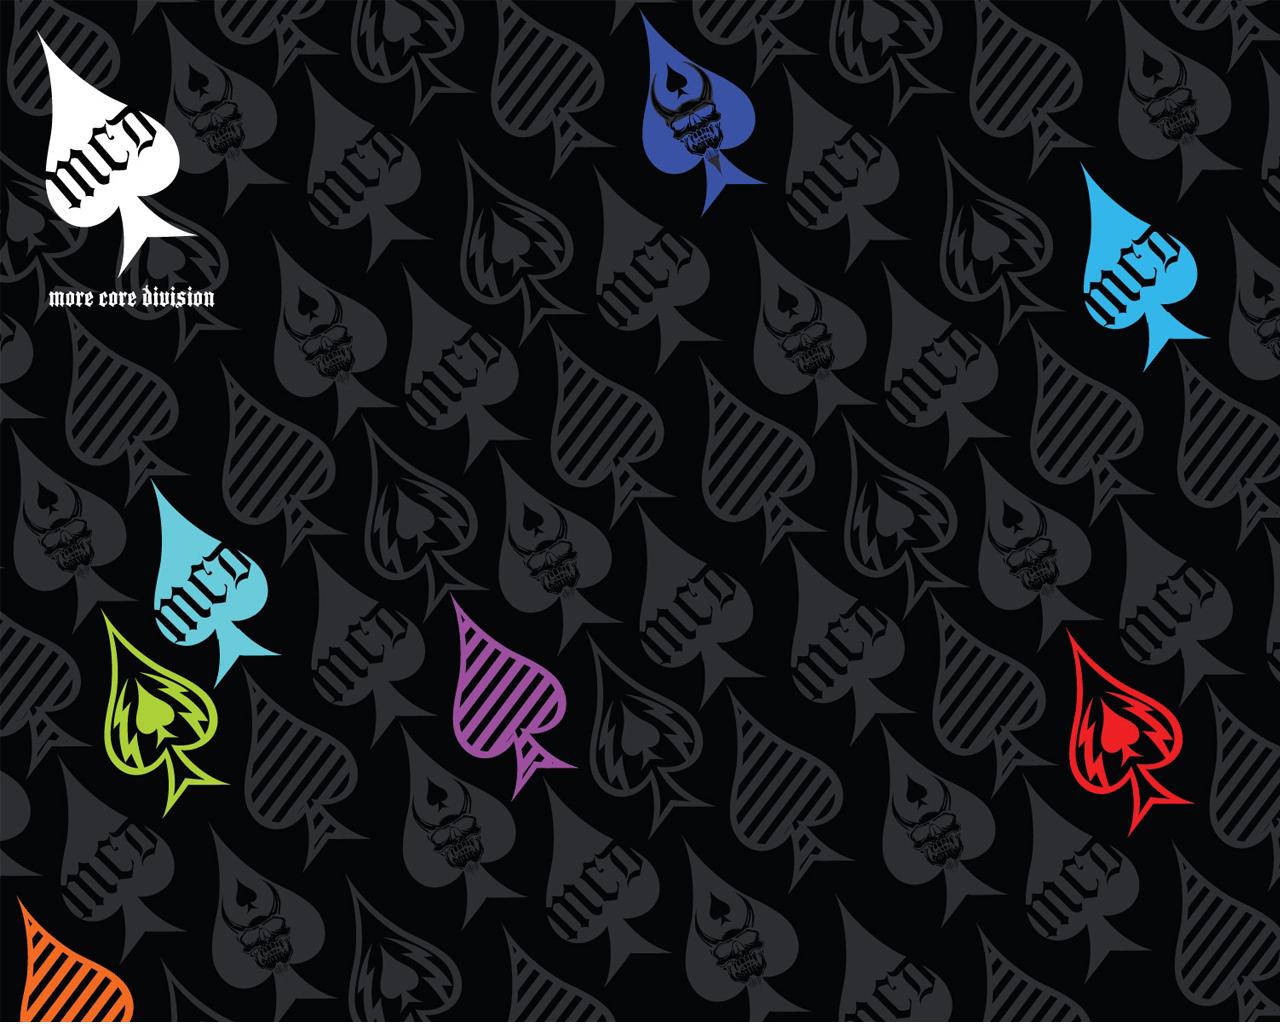 http://1.bp.blogspot.com/_mybCHJZuCMM/TNxCgi52CXI/AAAAAAAAAB0/8AyqU5iomjM/s1600/wallpaper_pattern_1280_1024.jpg